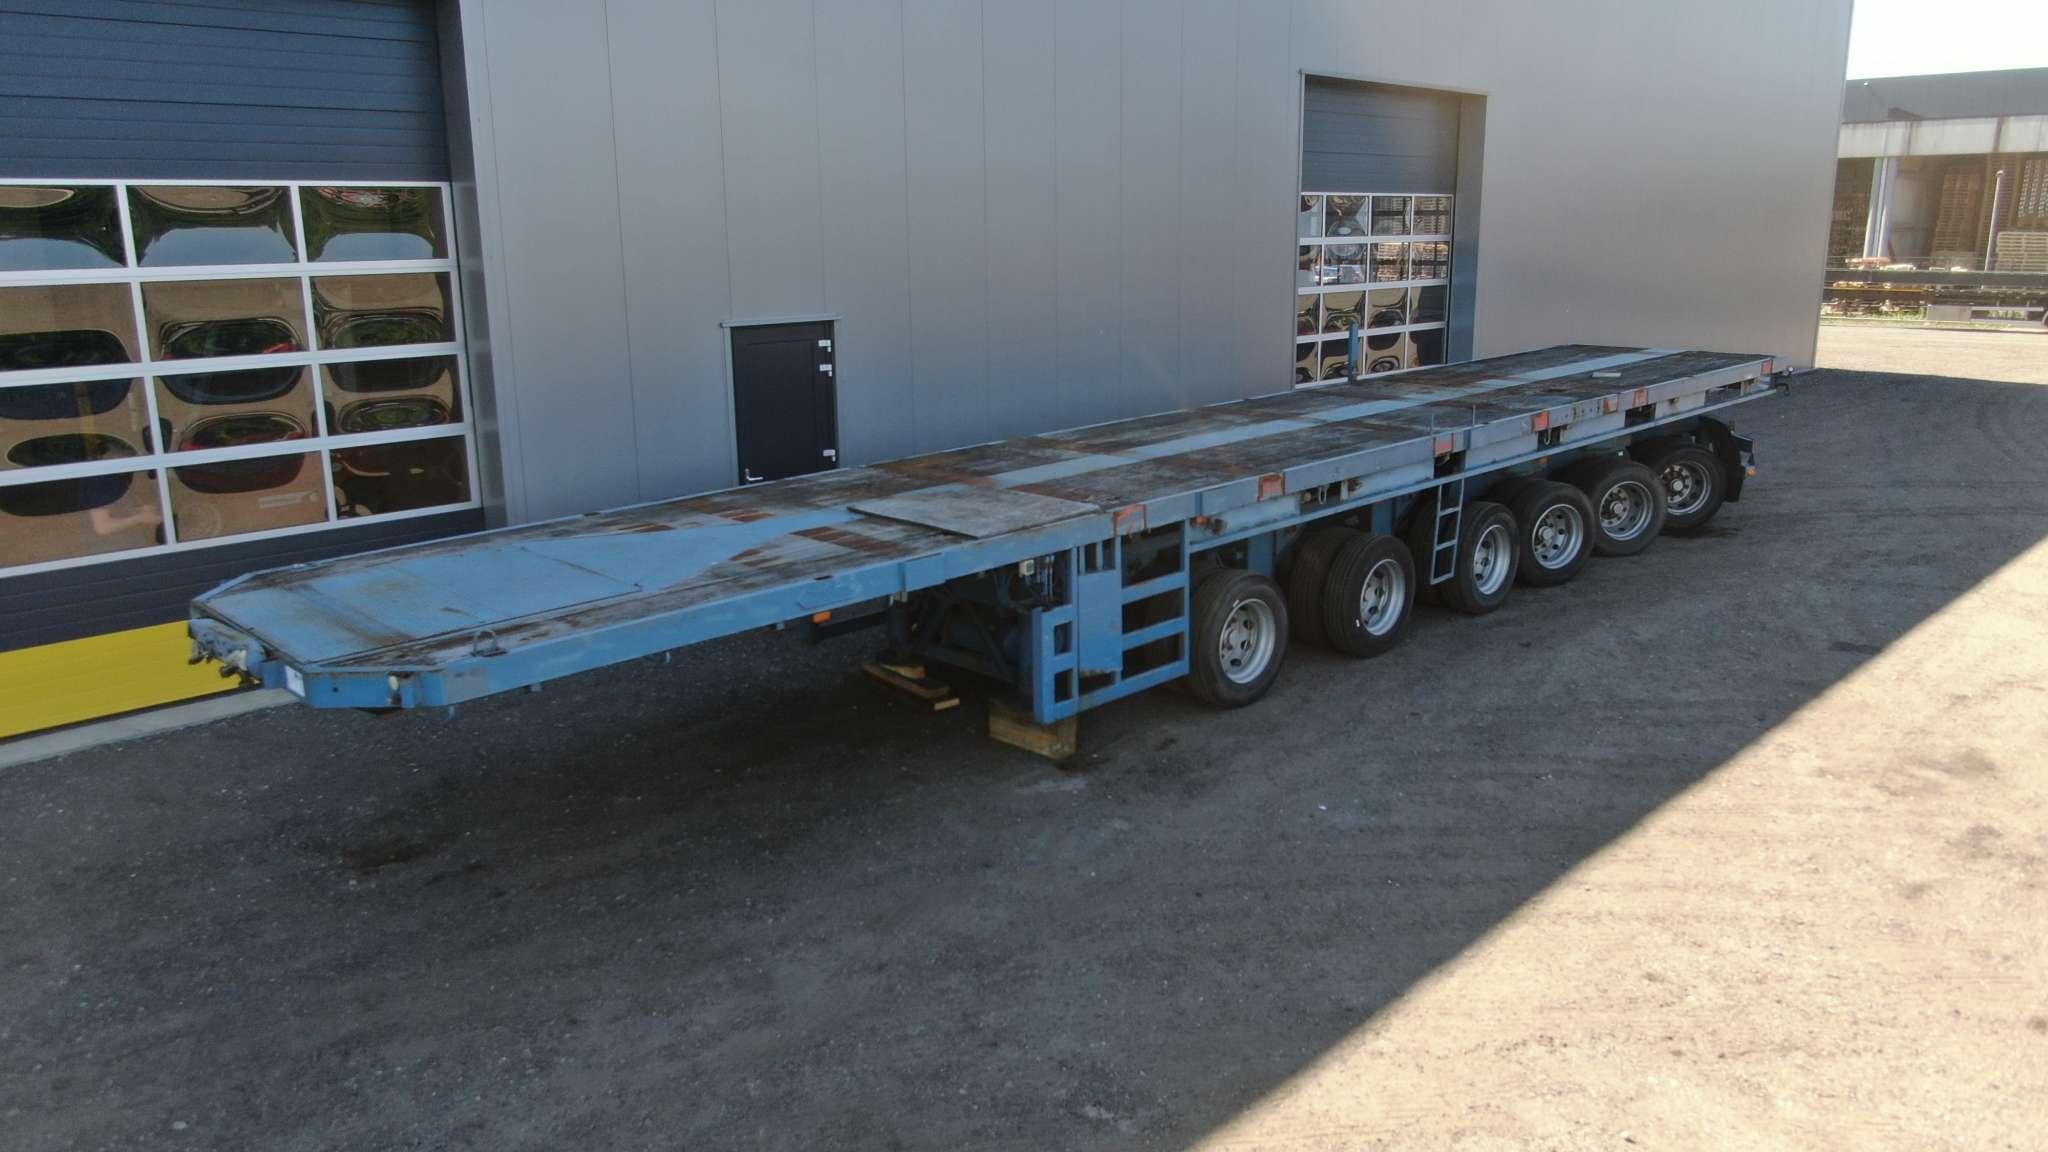 Ballast trailer | 6 axle | loadfloor length 15 m | payload 85 ton